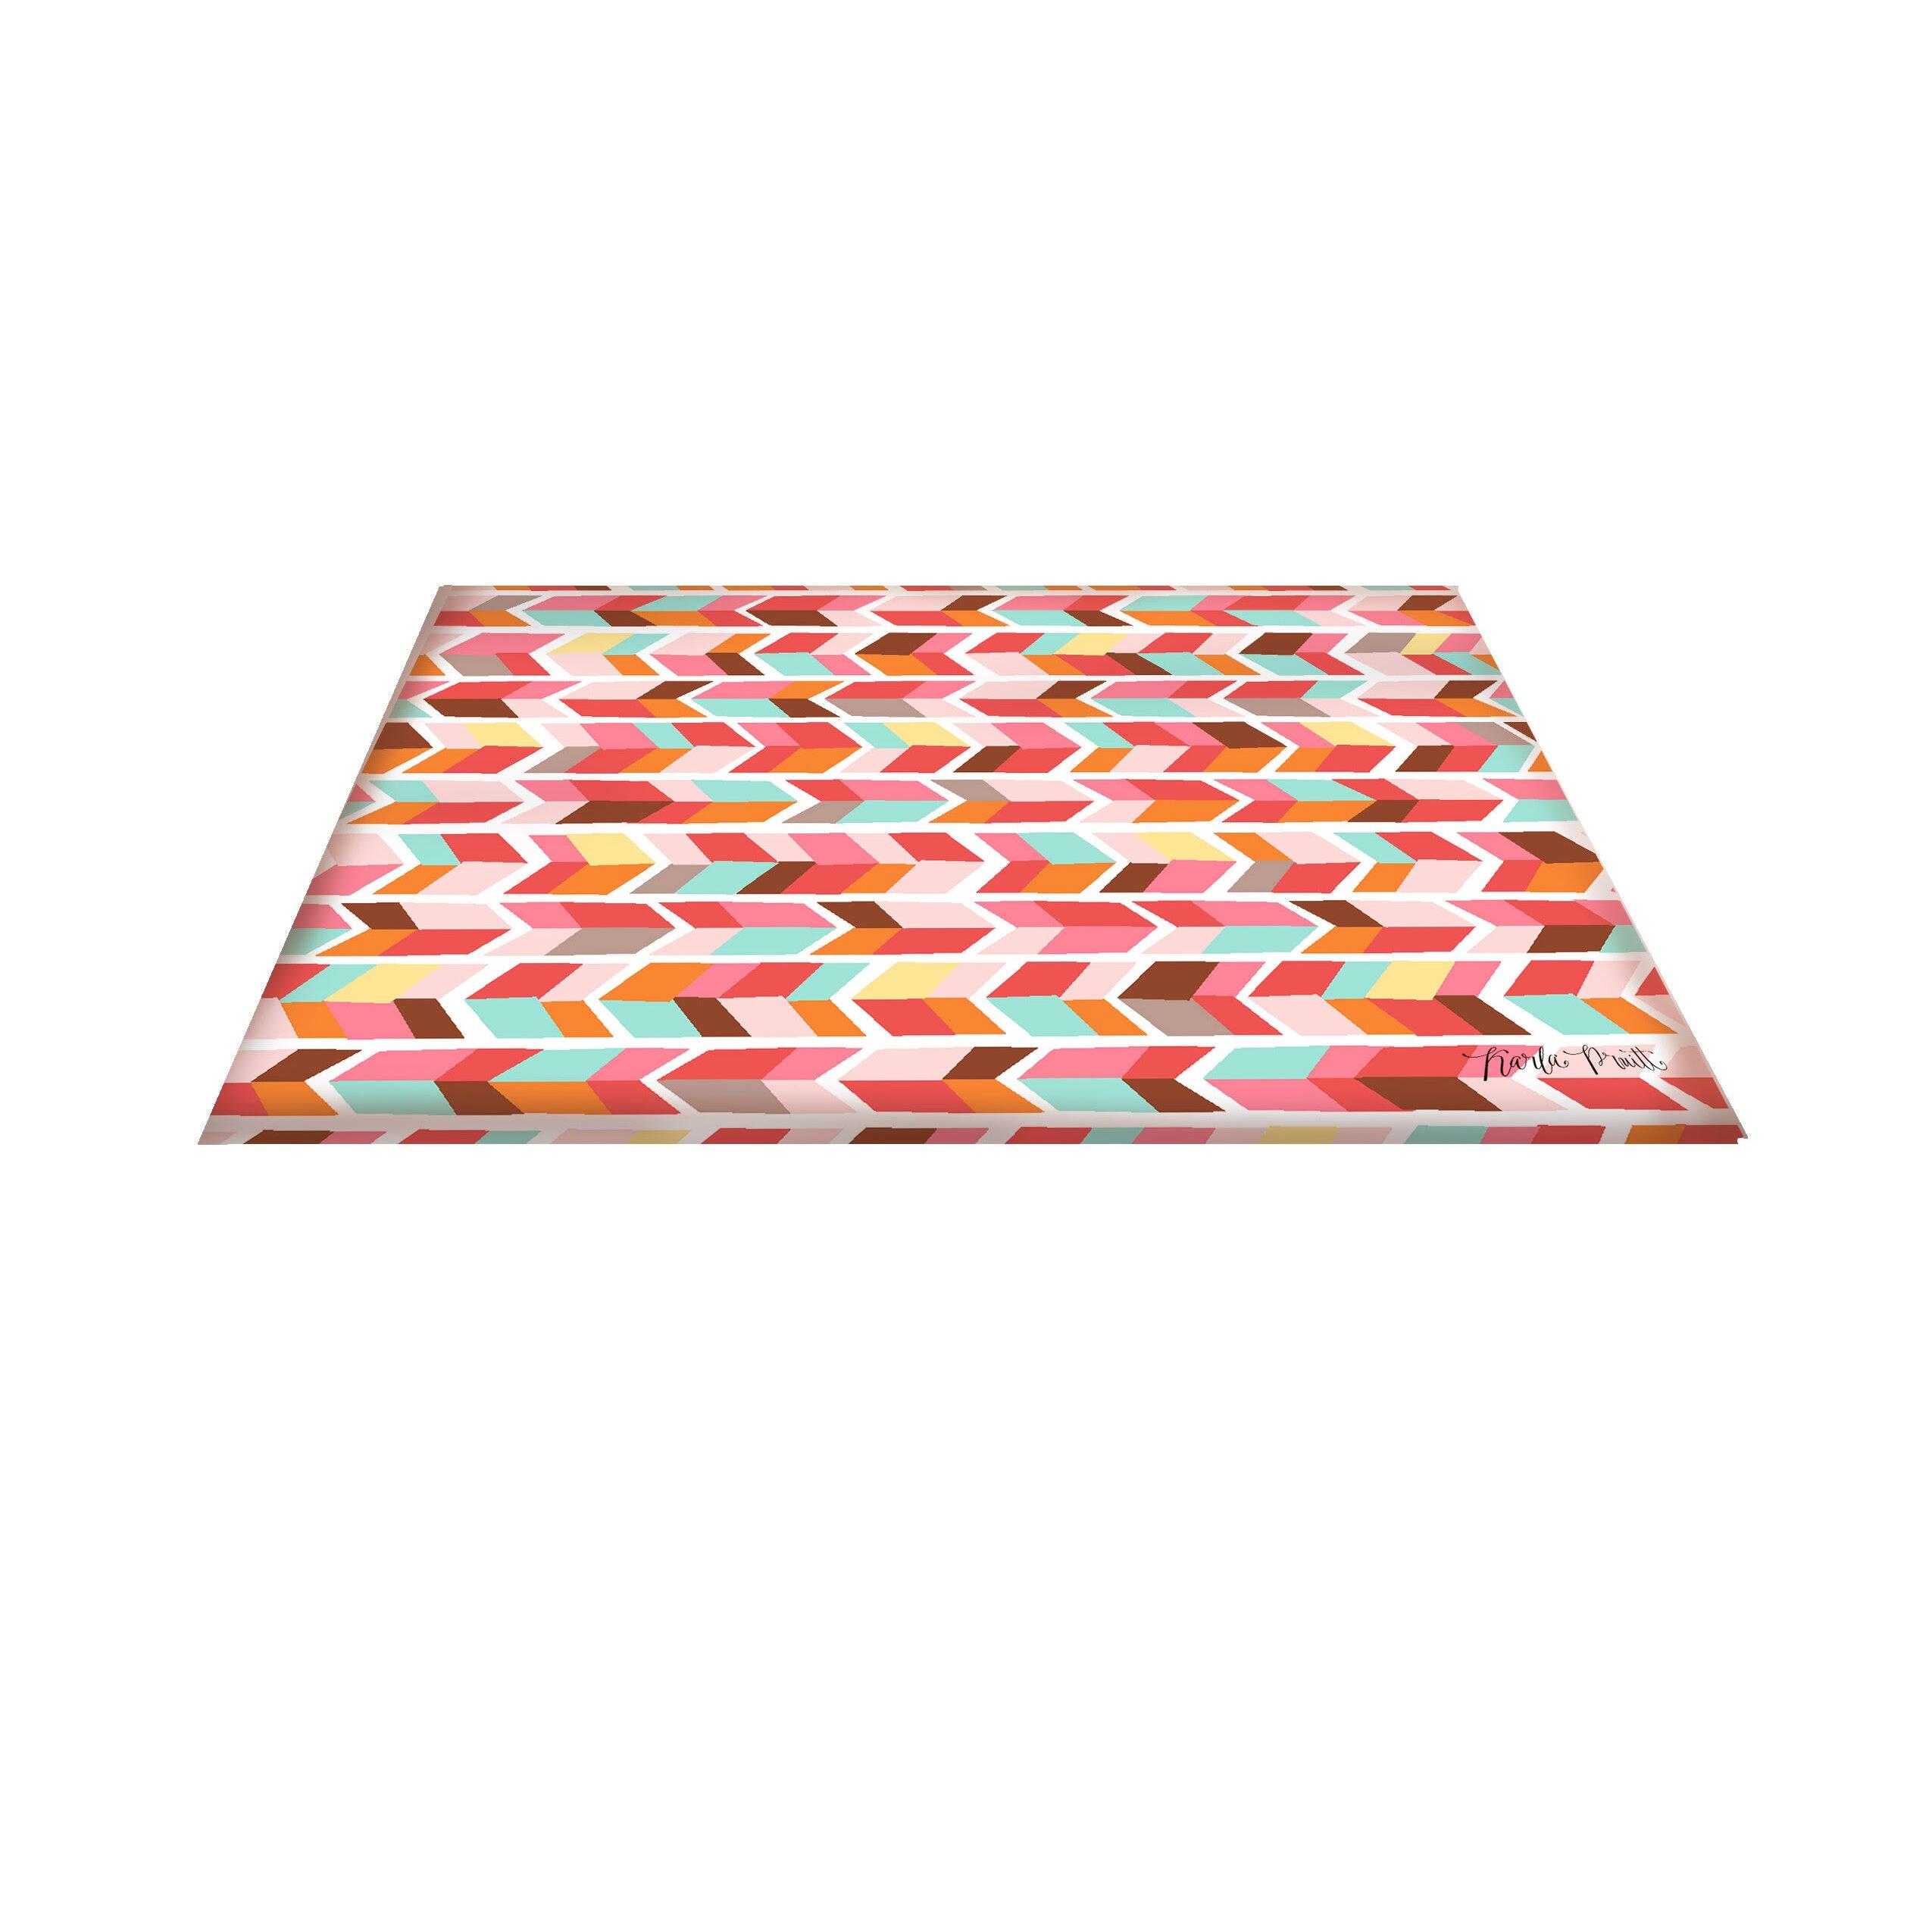 Manual woodworkers amp weavers arrowhead pink blue chevron area rug